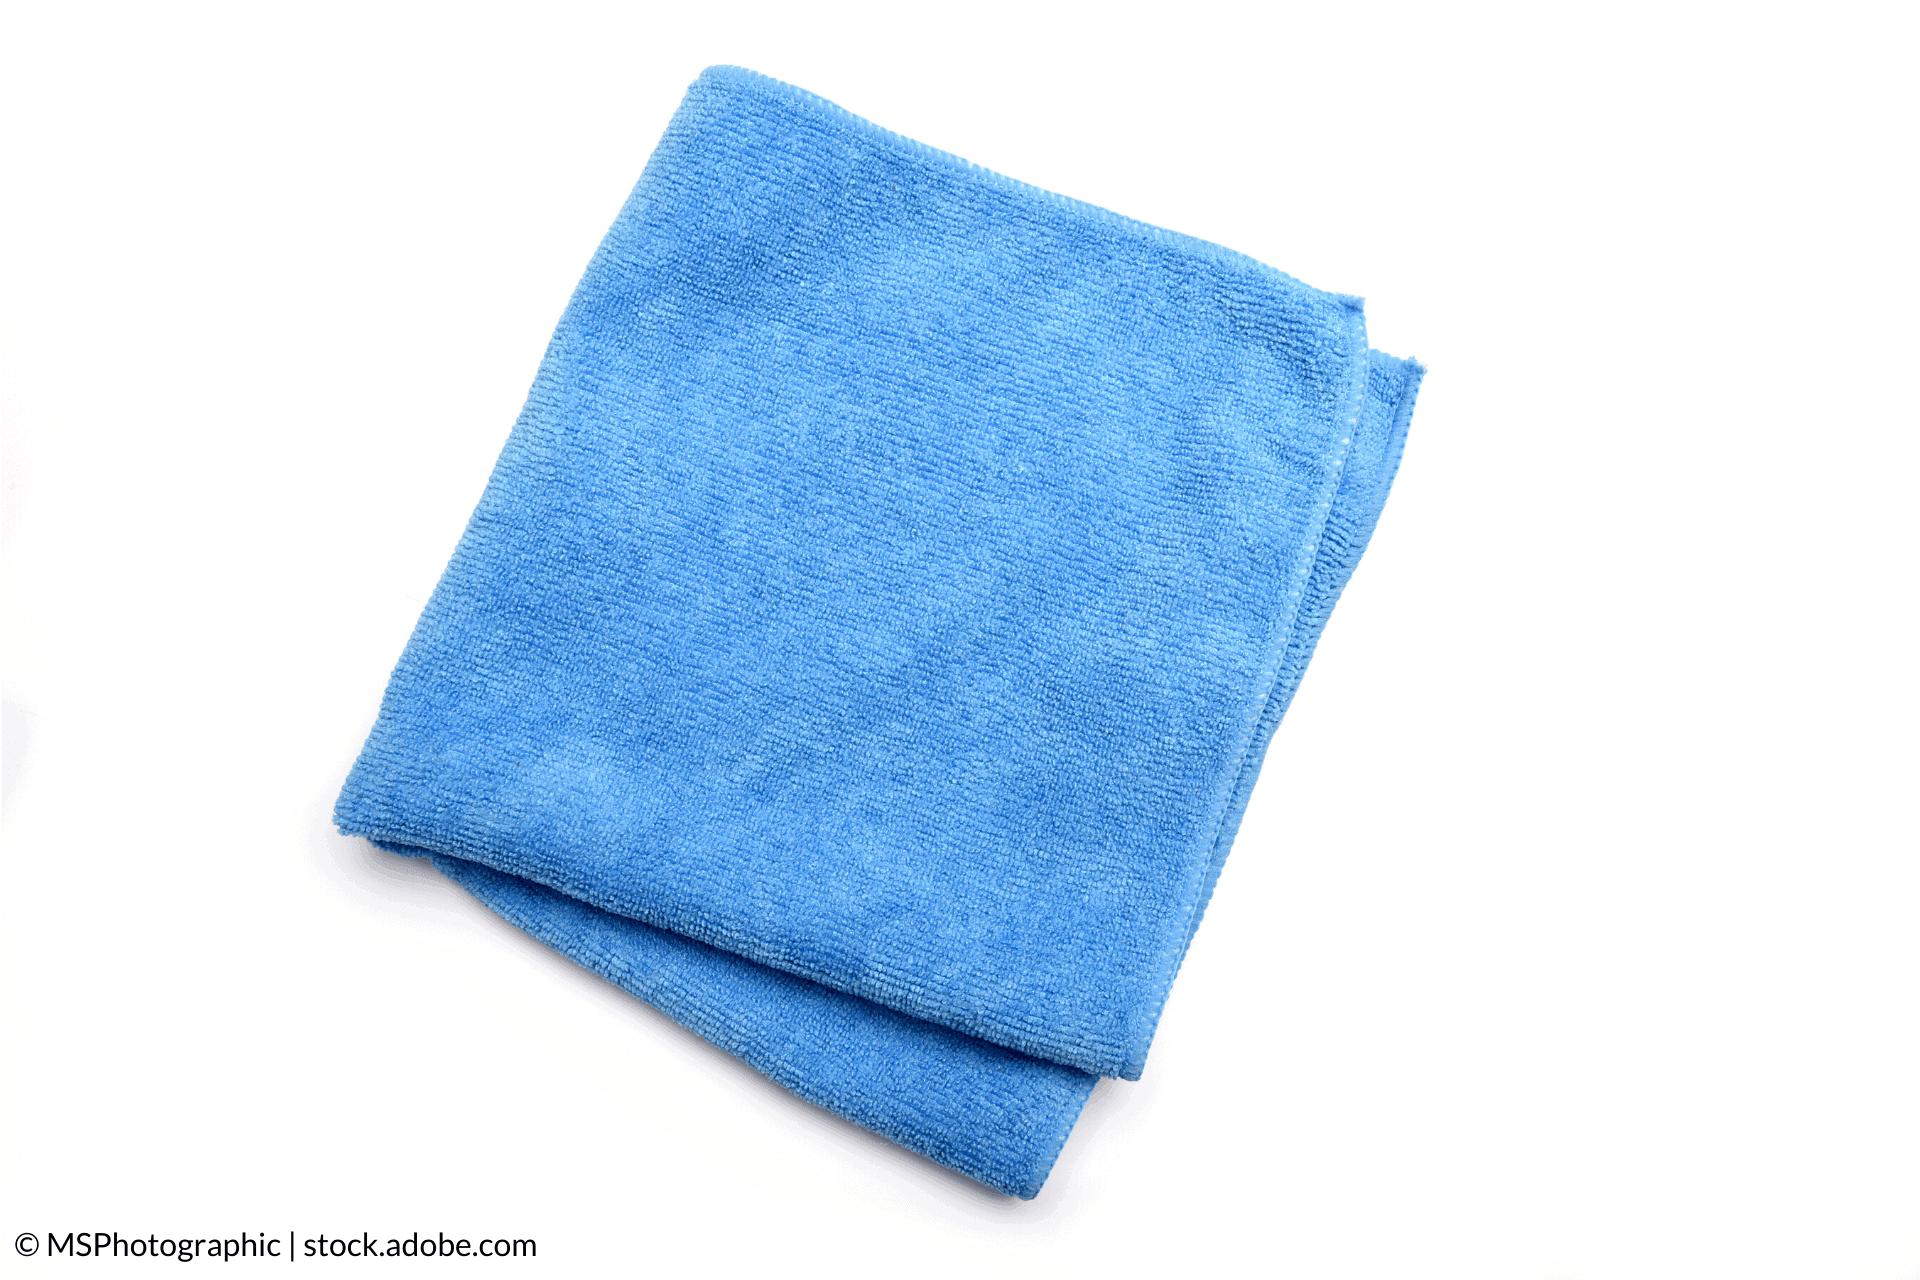 cleancloth 001